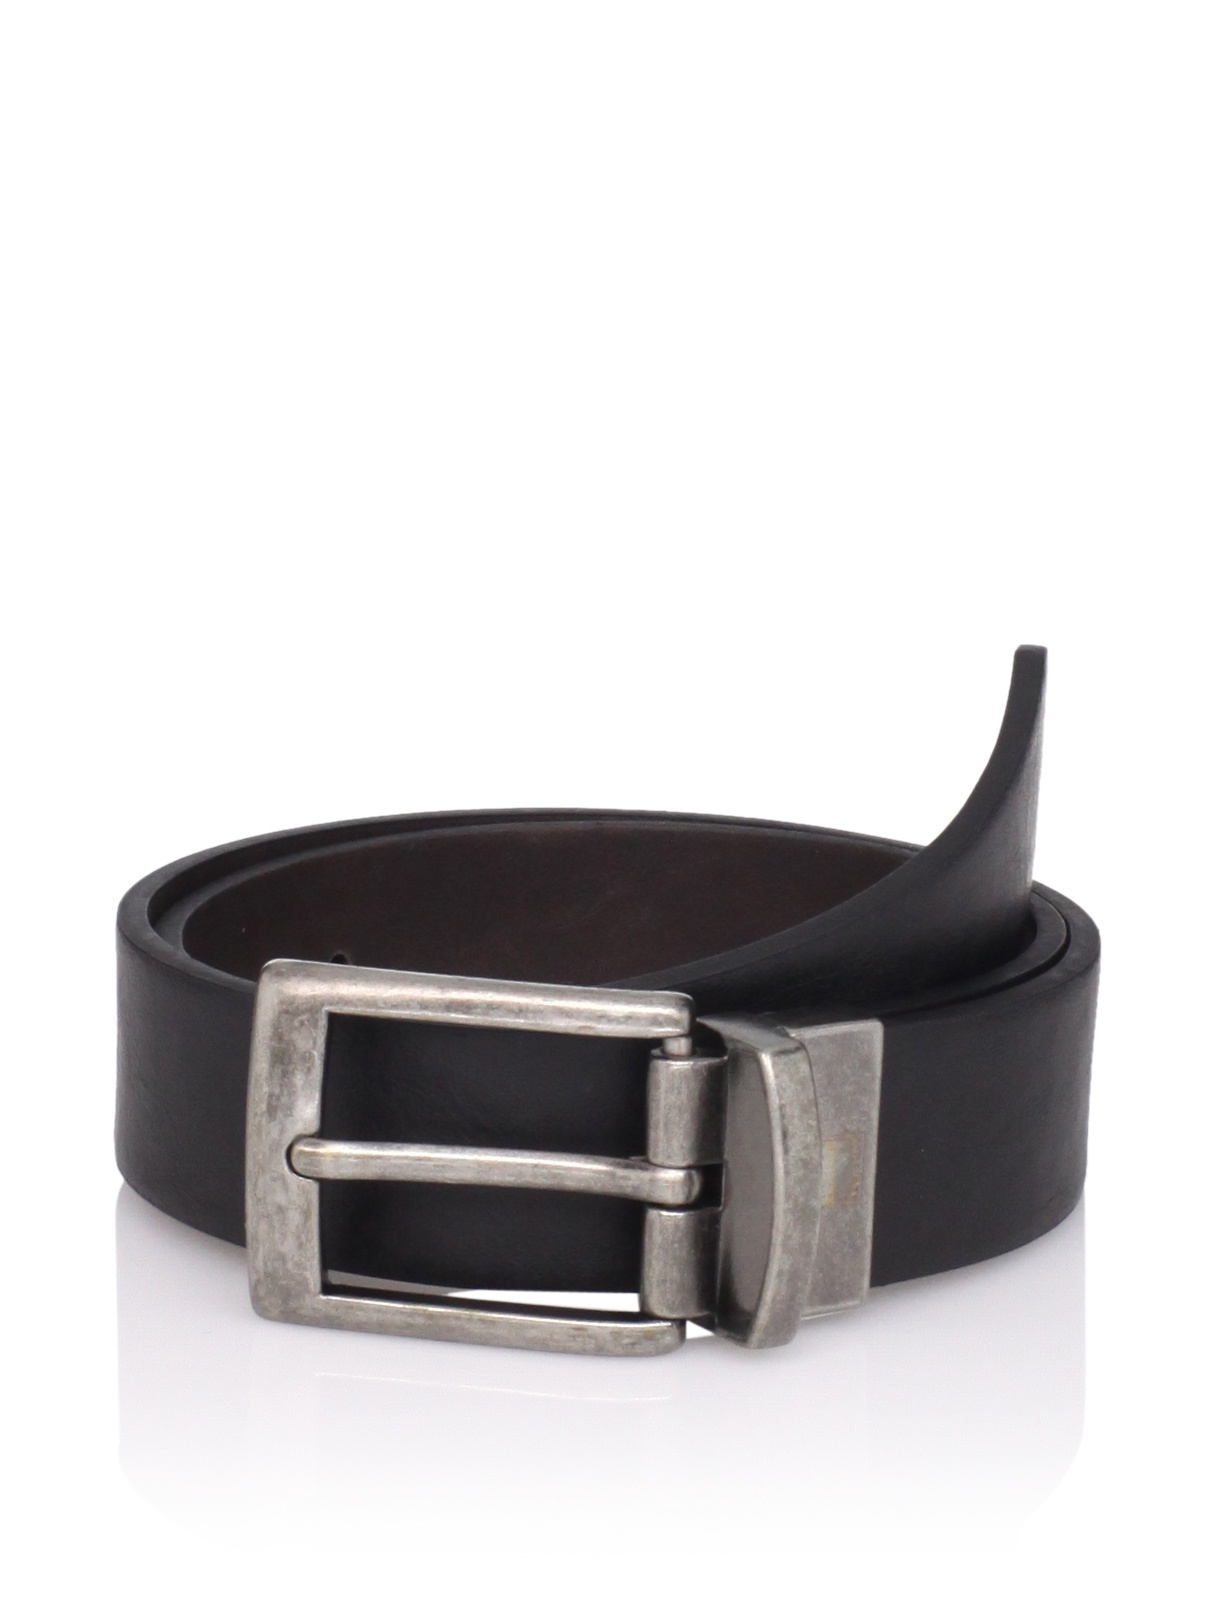 Ike Behar Boy's Reversible Leather Belt (Black/brown)